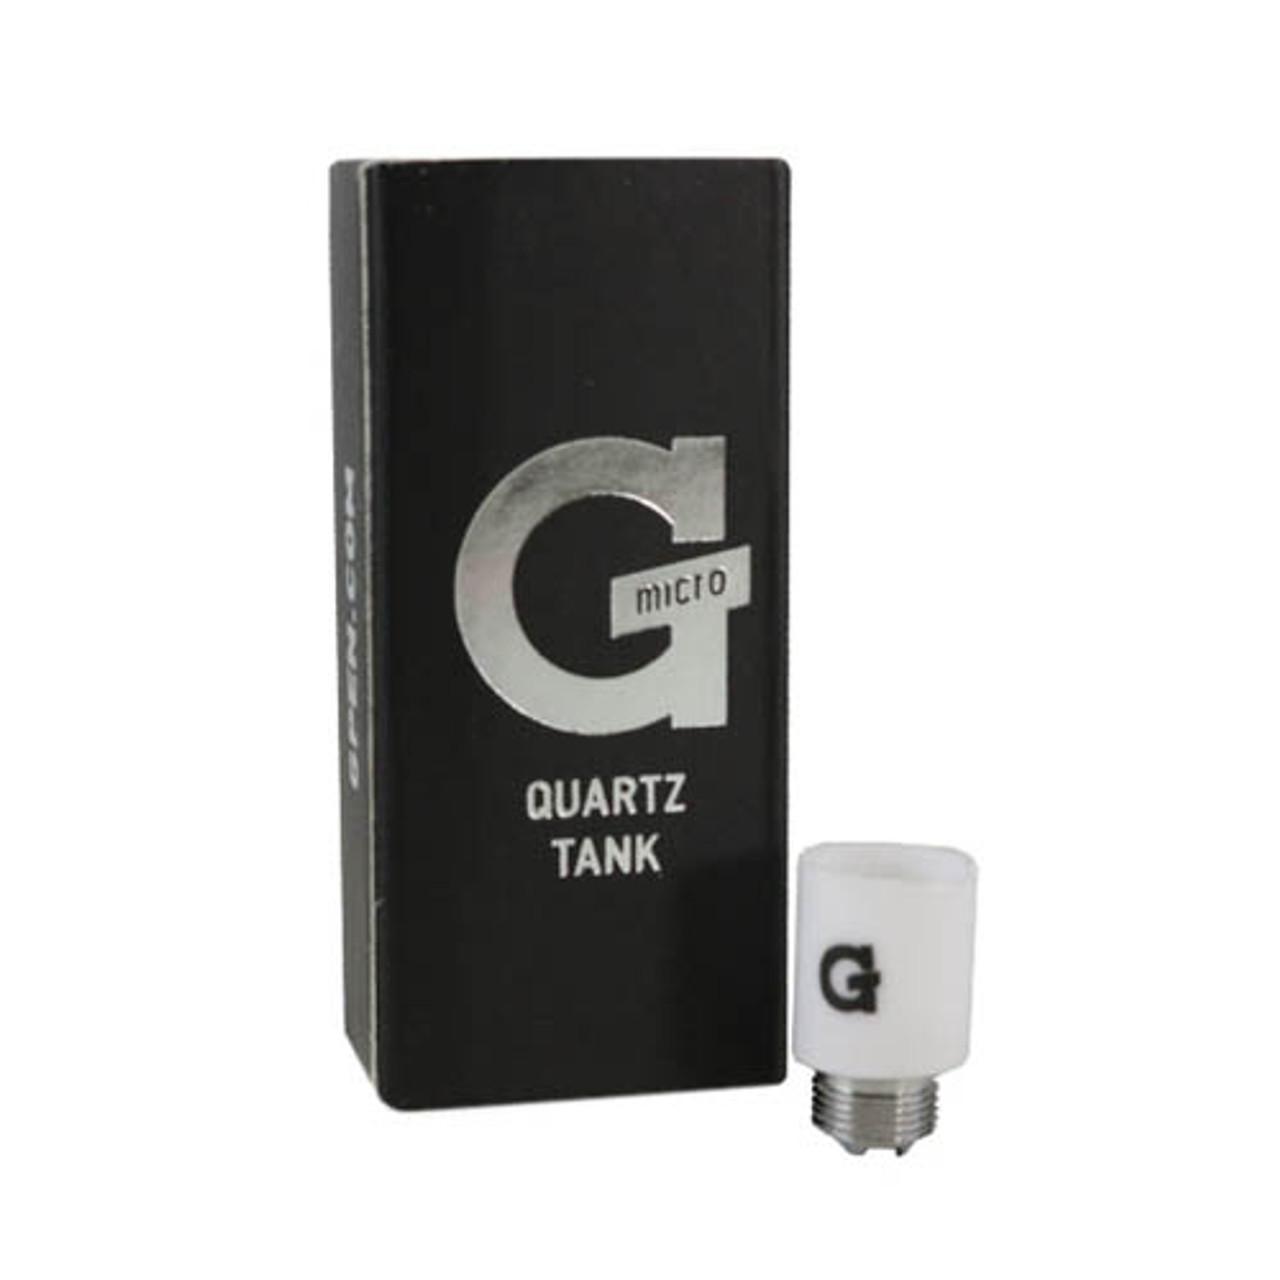 Grenco Micro G Threaded Quartz Oil Tank